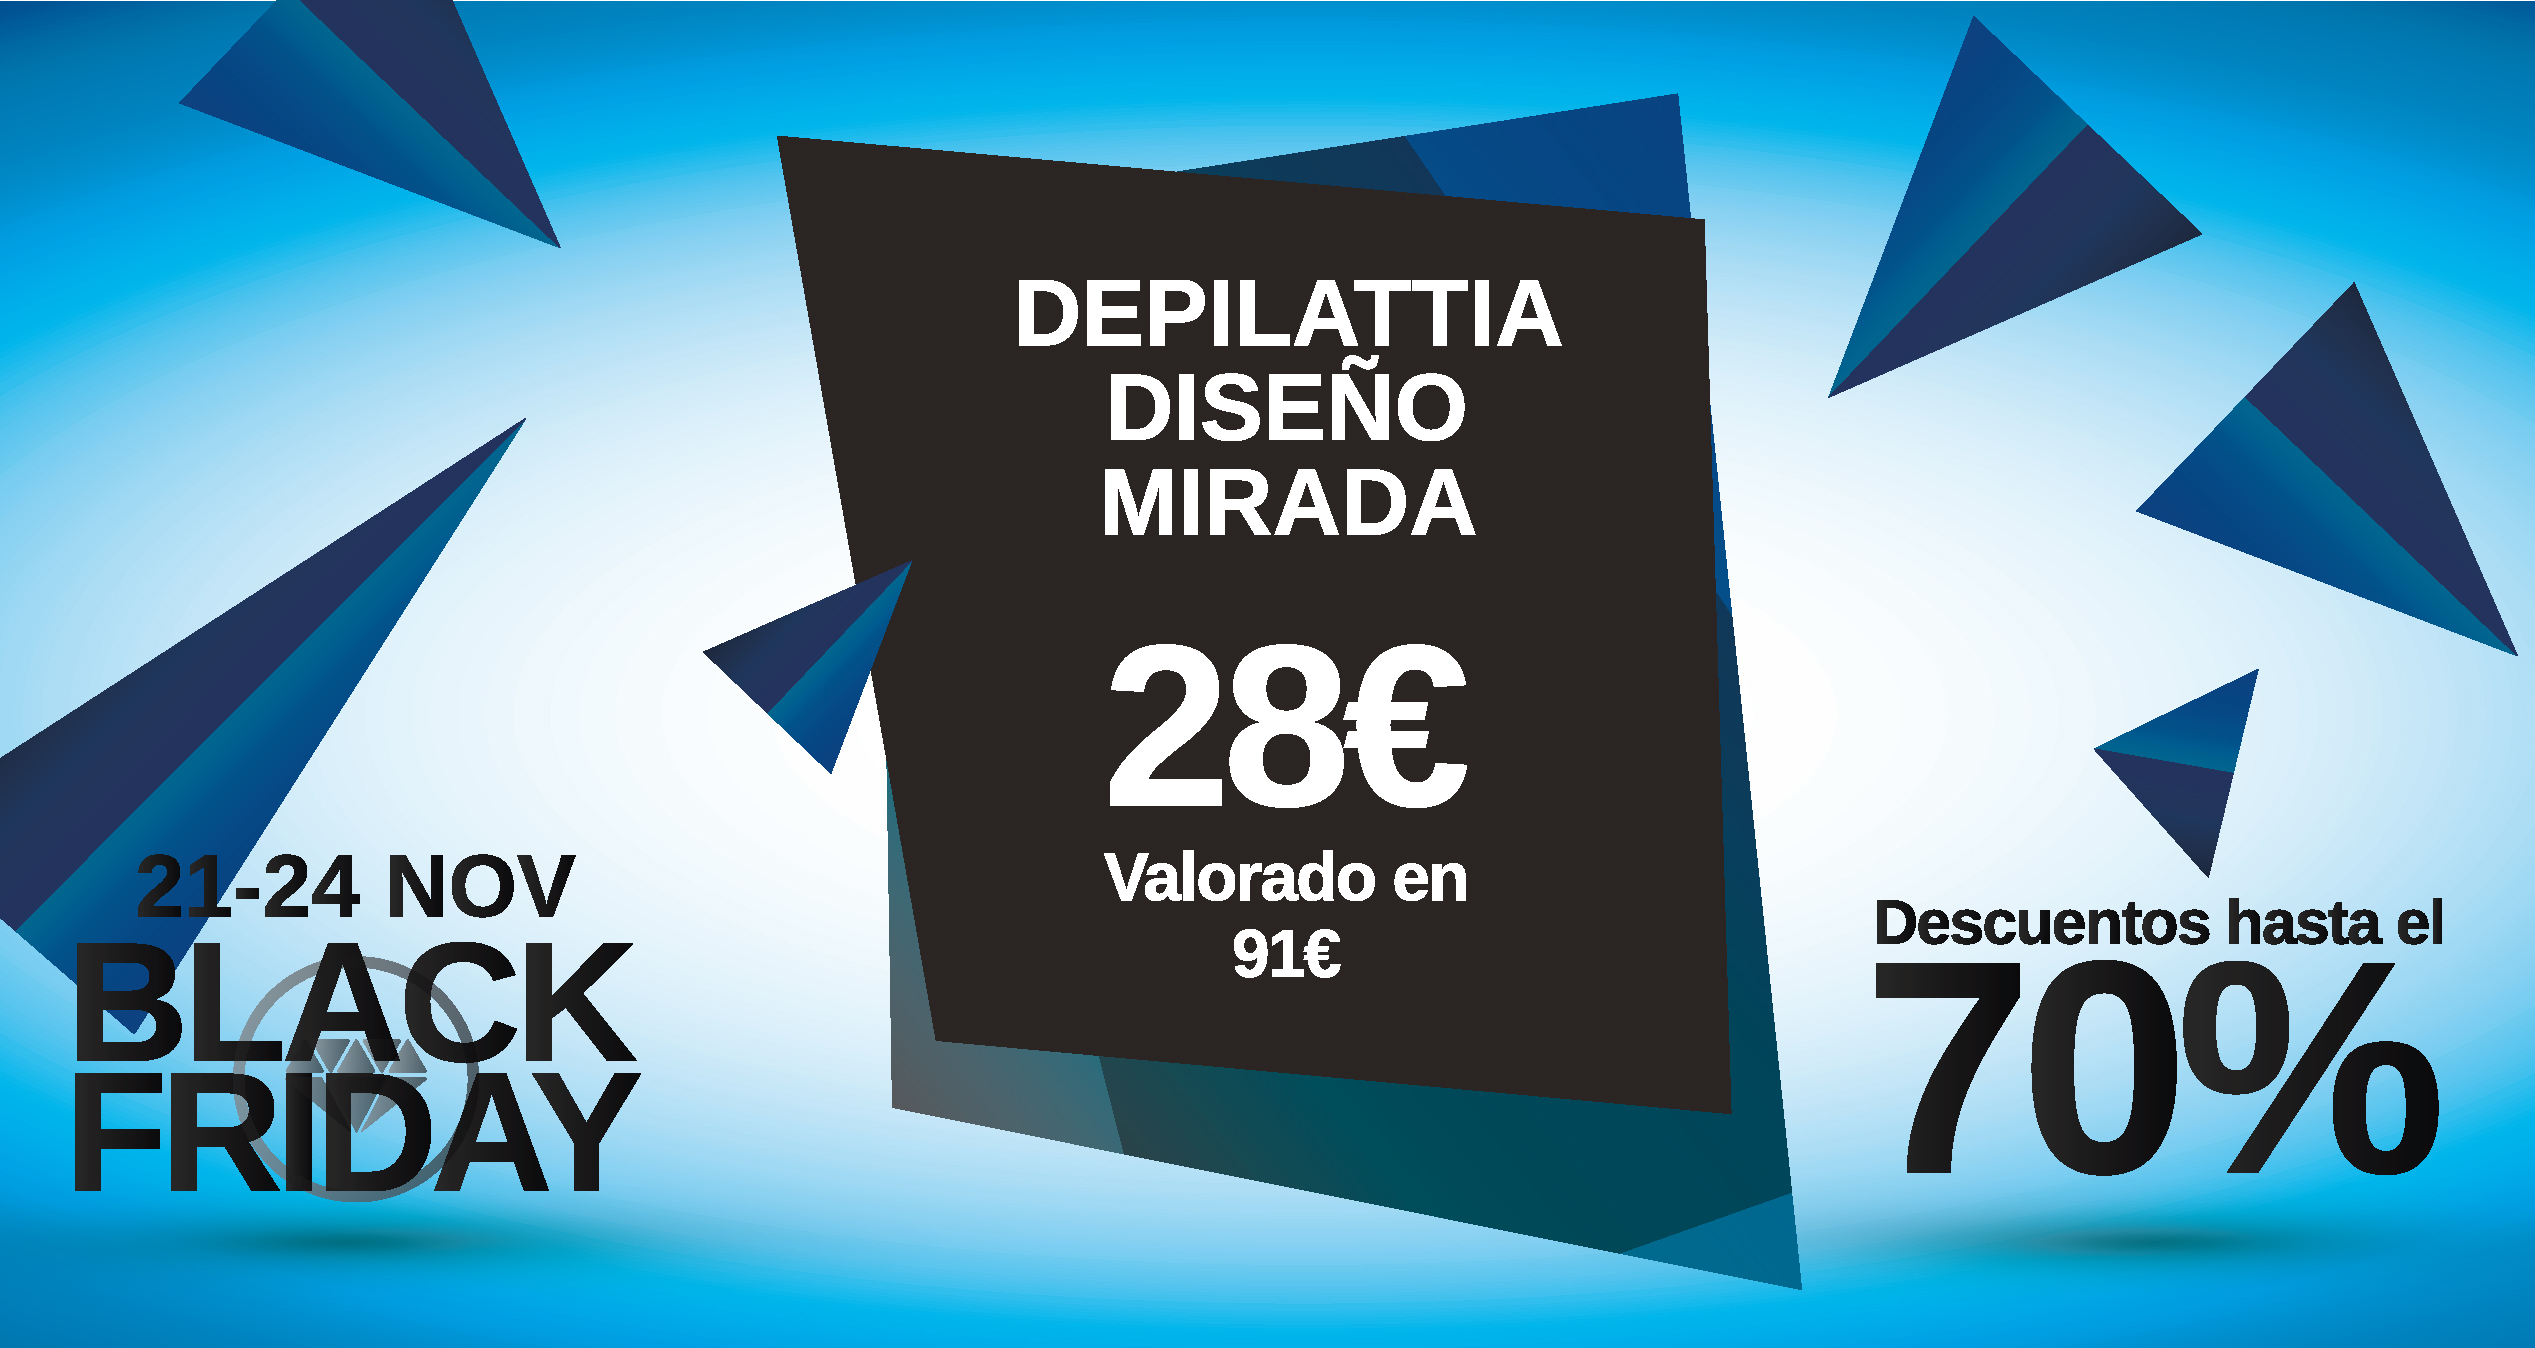 AAFF-Black-friday-depilattia-spa_mirada-FACEBOOK